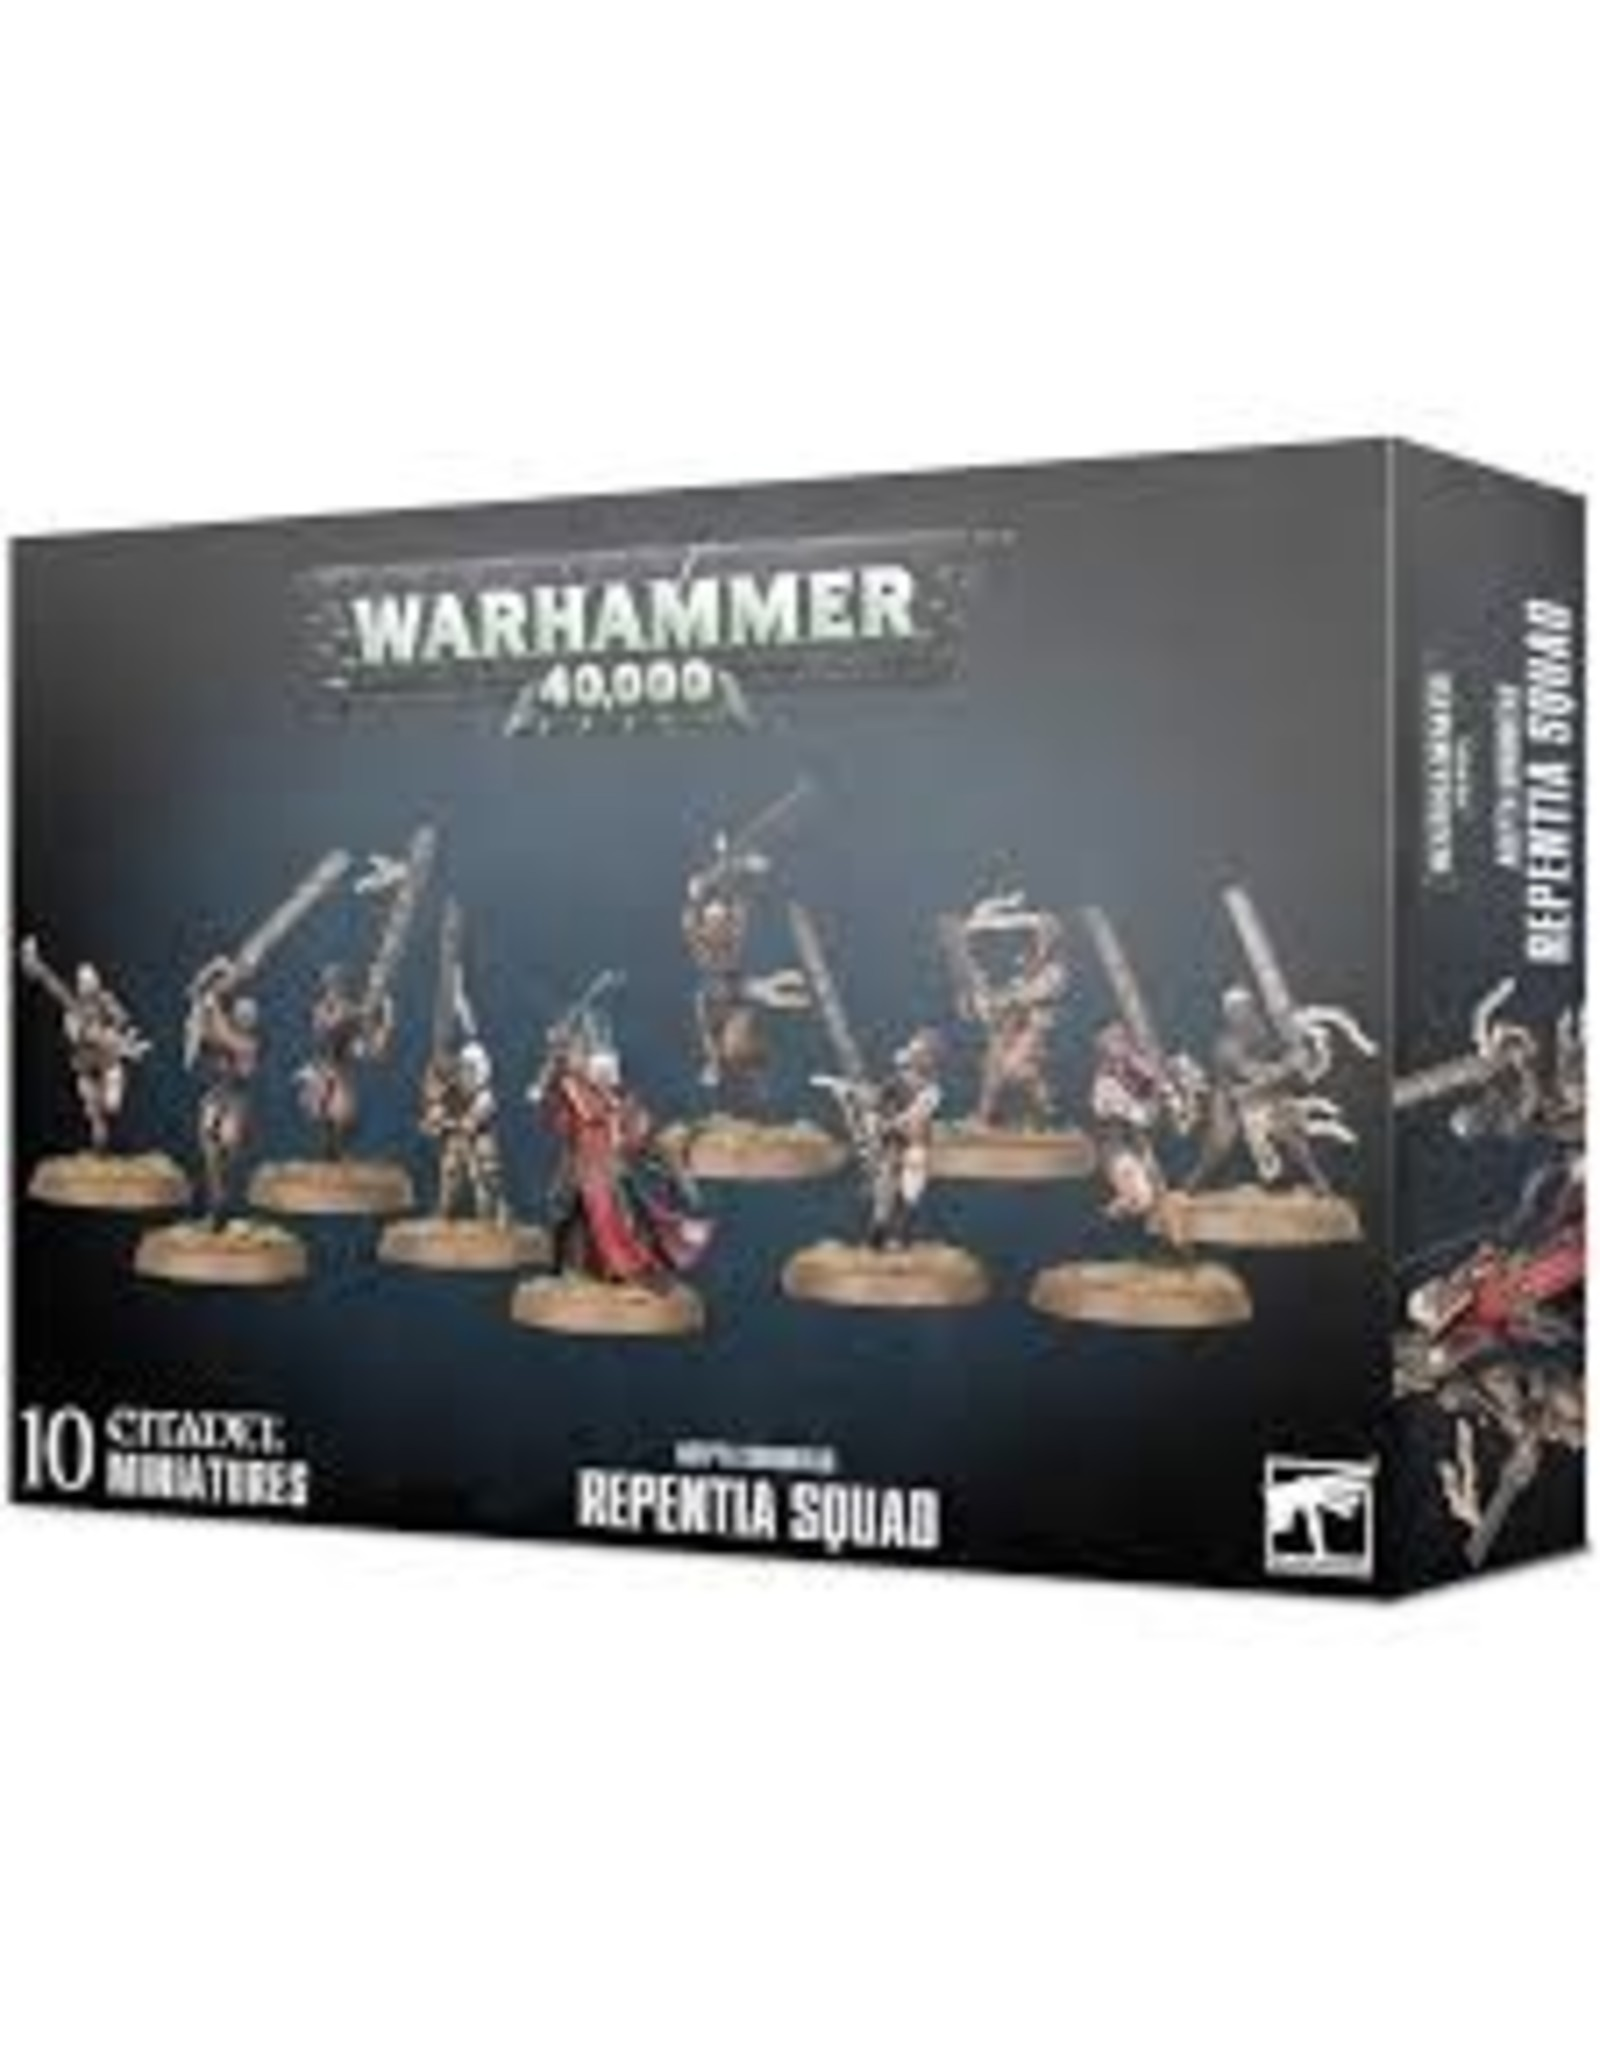 Warhammer 40K Adepta Sororitas Repentia Squad